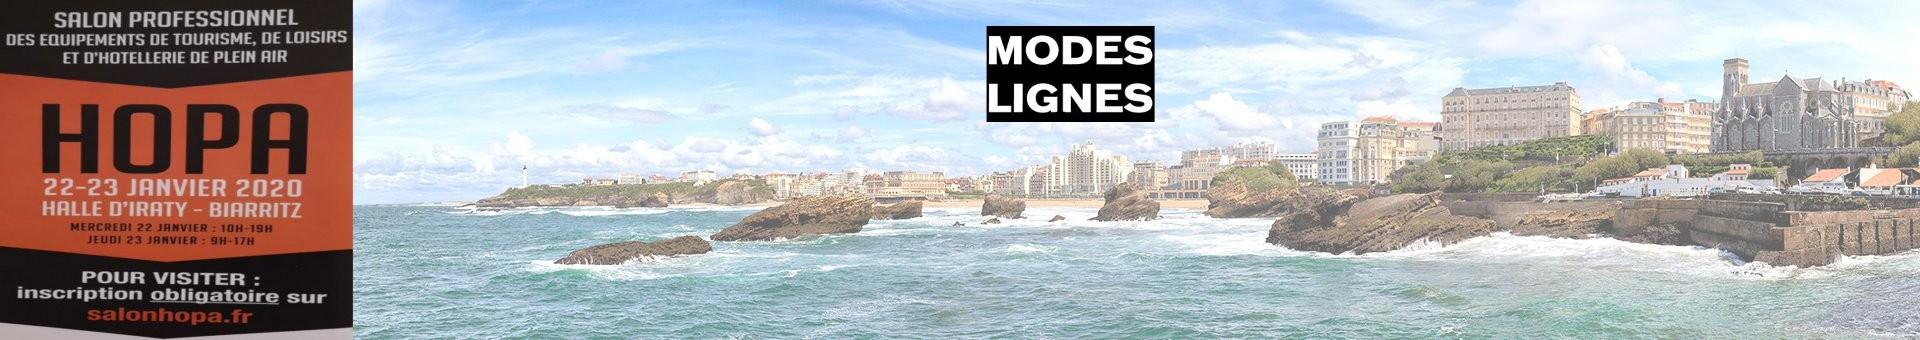 Salon Professionnel Biarritz 2020